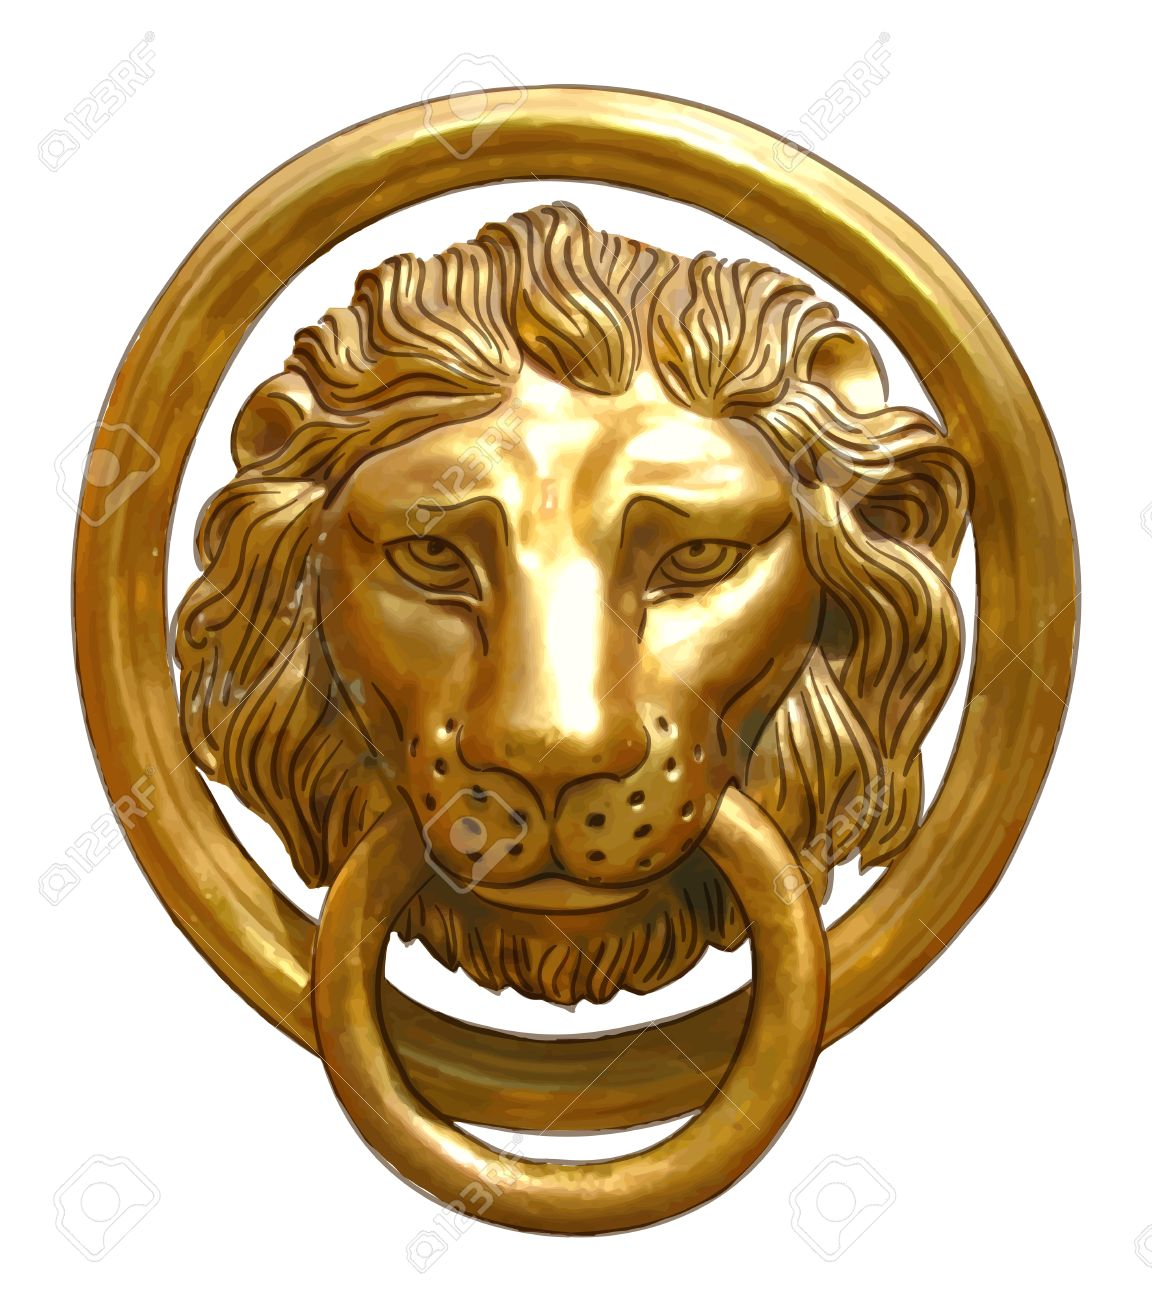 The Door Handle   The Head Of A Lion. Vector Illustration. Stock Vector